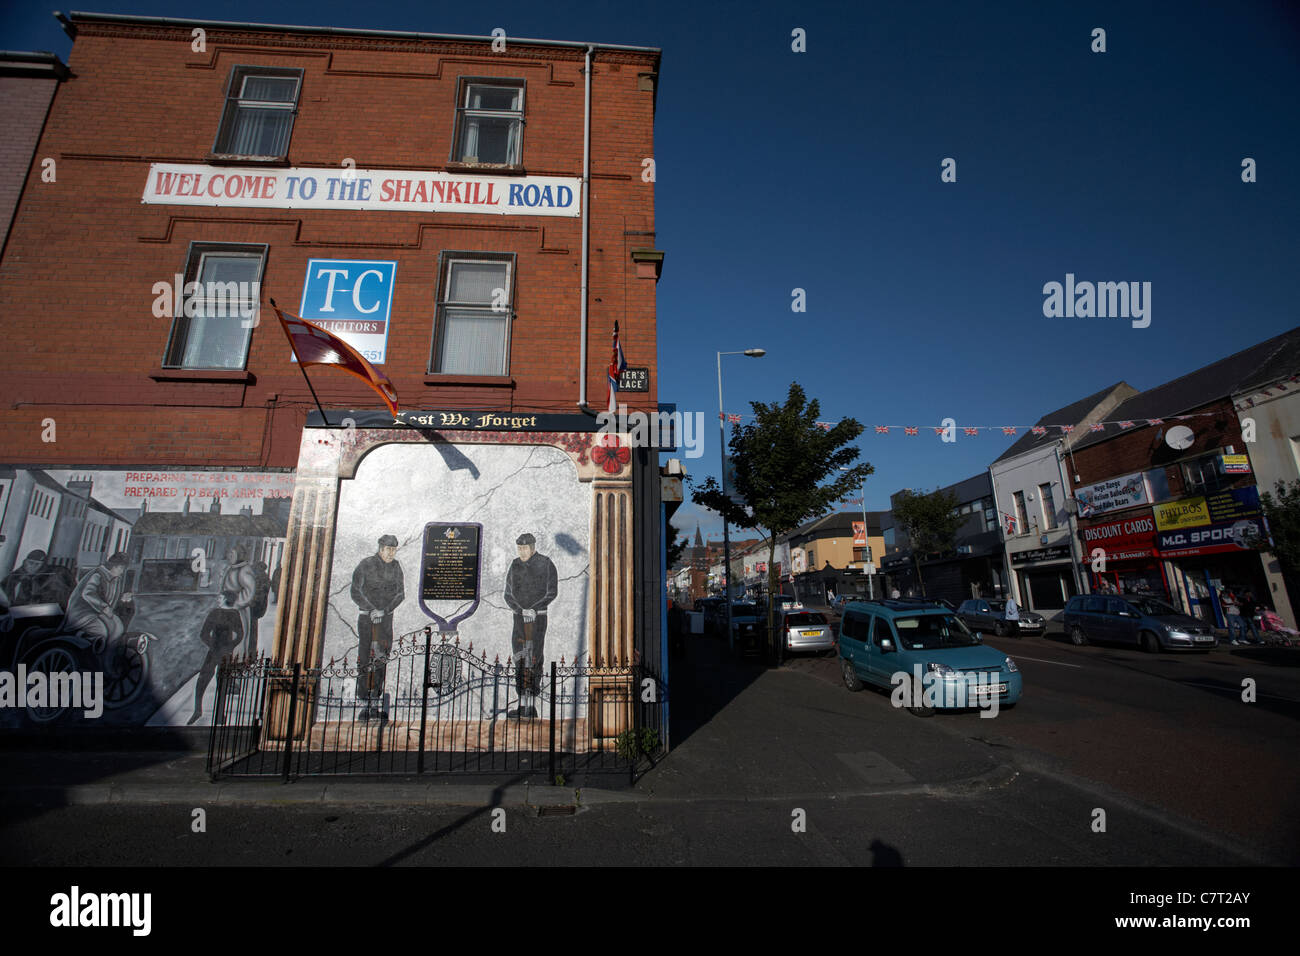 wall mural on the Shankill road, Belfast, Northern Ireland, UK. - Stock Image